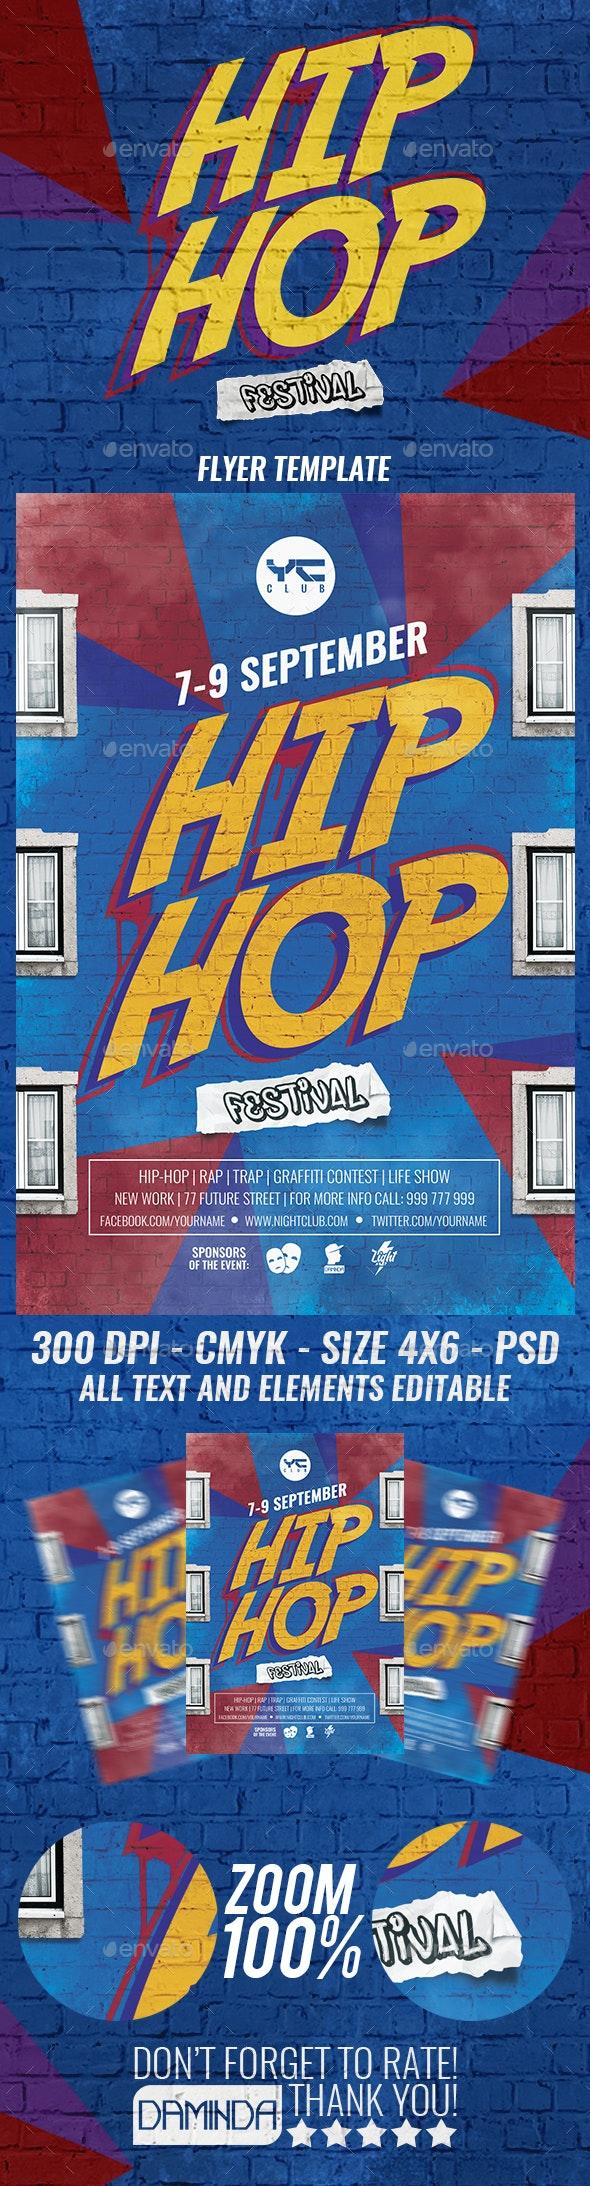 Hip Hop Festival Flyer Template - Clubs & Parties Events